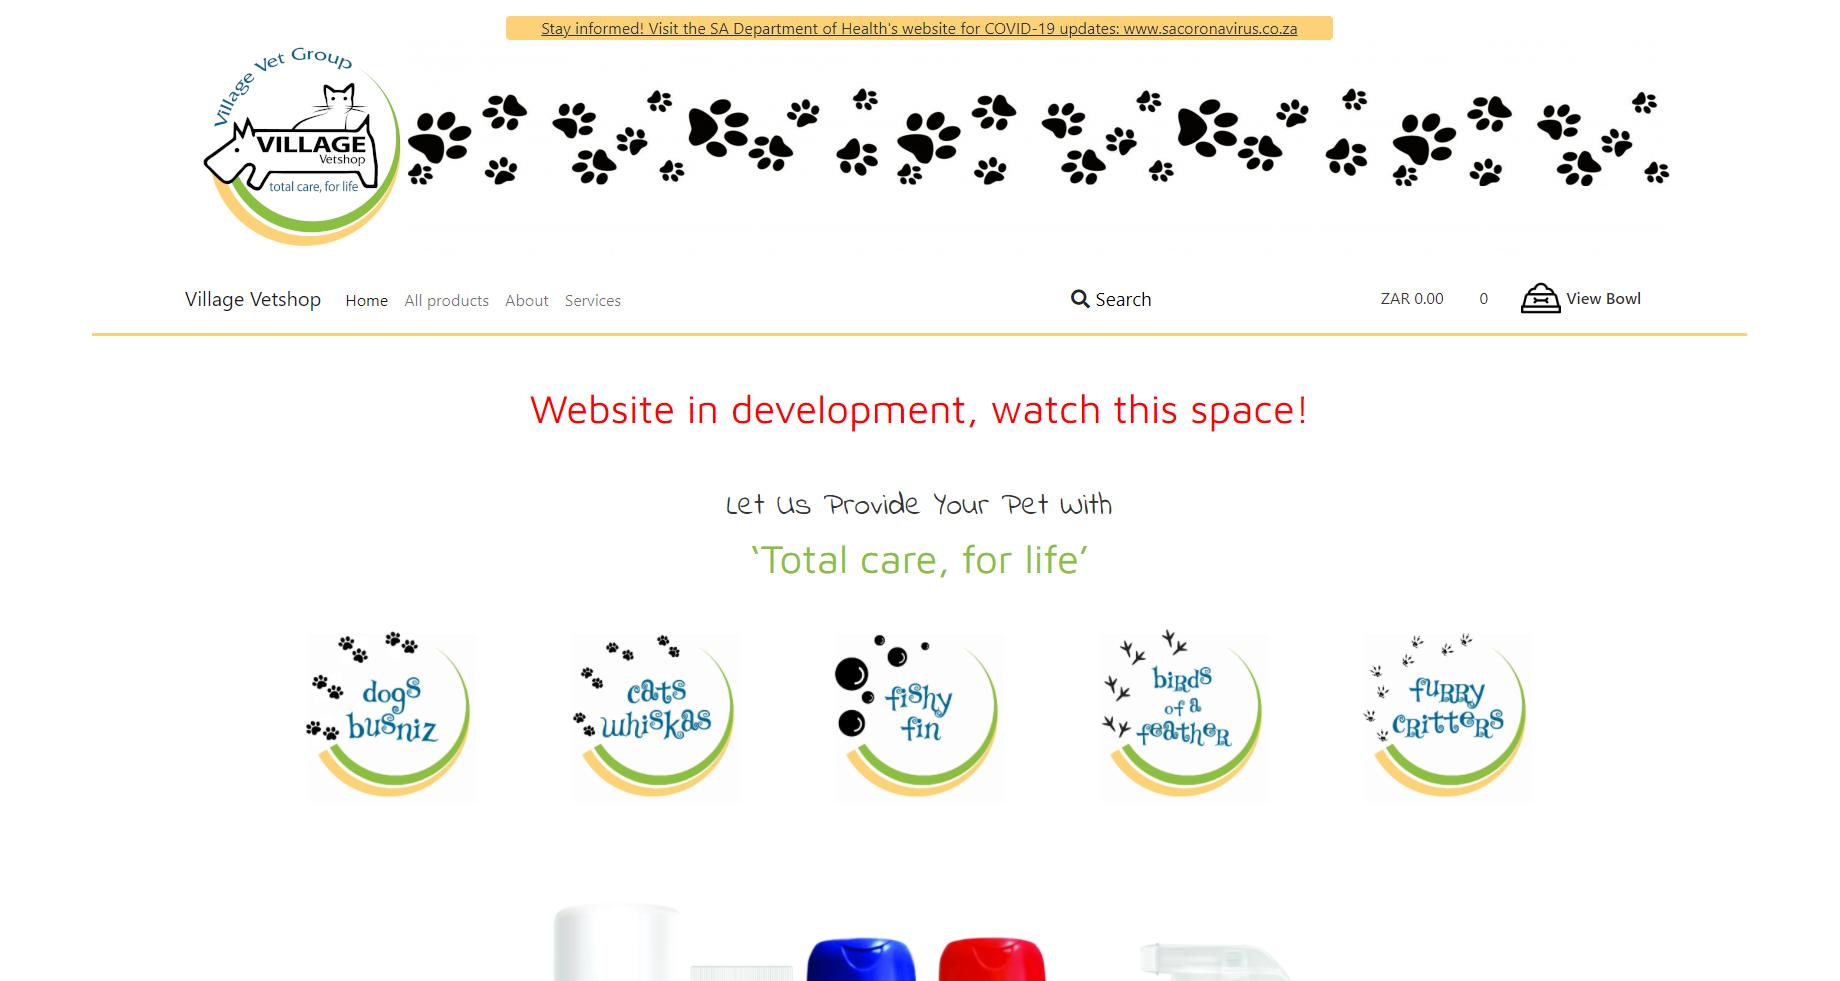 SAGTA website